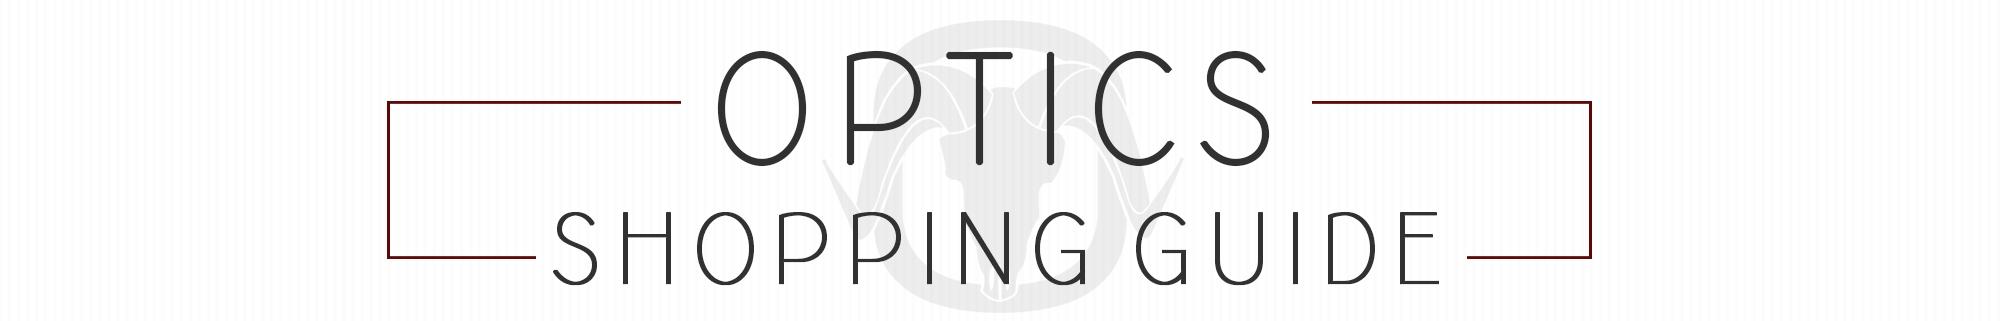 BlackOvis Optics Selection Guide